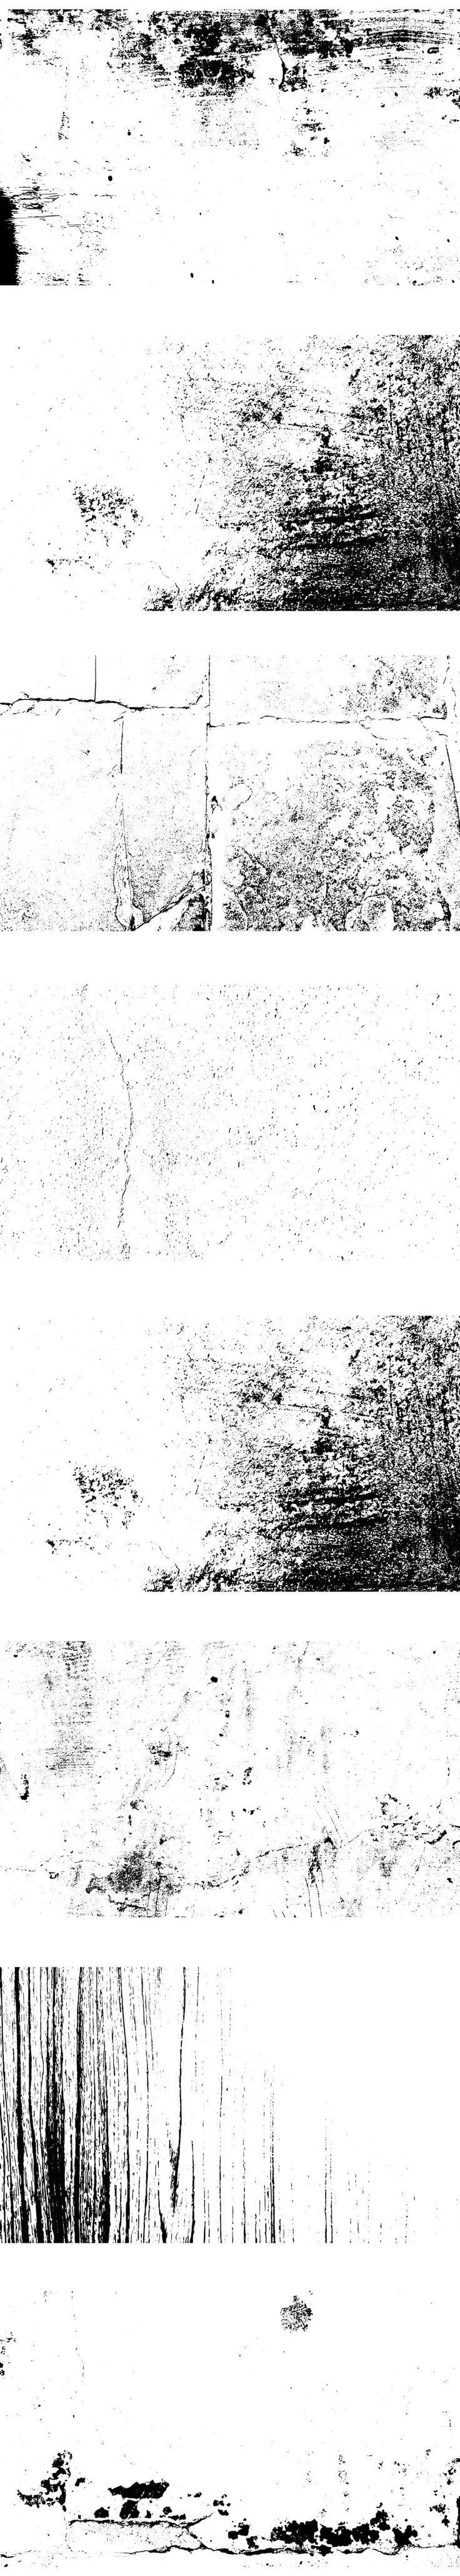 texture-hd-vectorielle